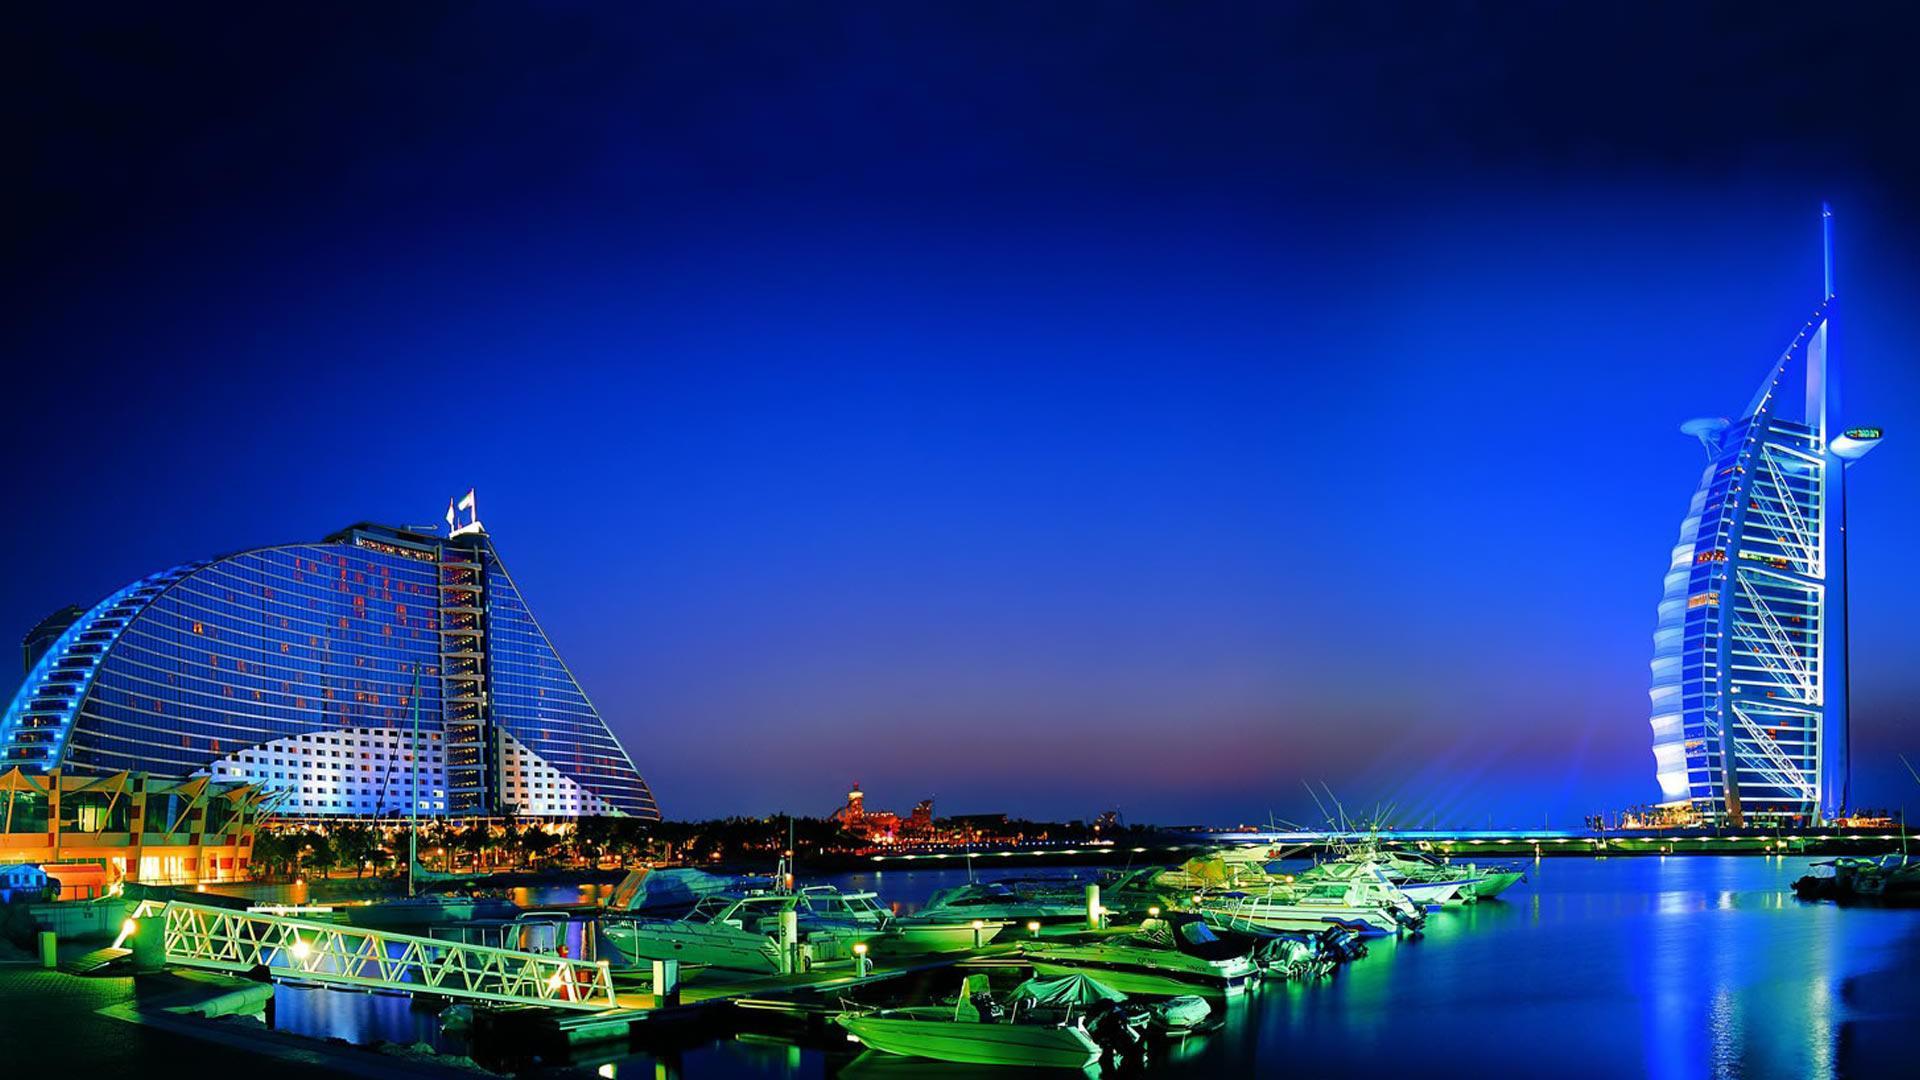 UAE leads region in economic freedom; ranks 8th globally